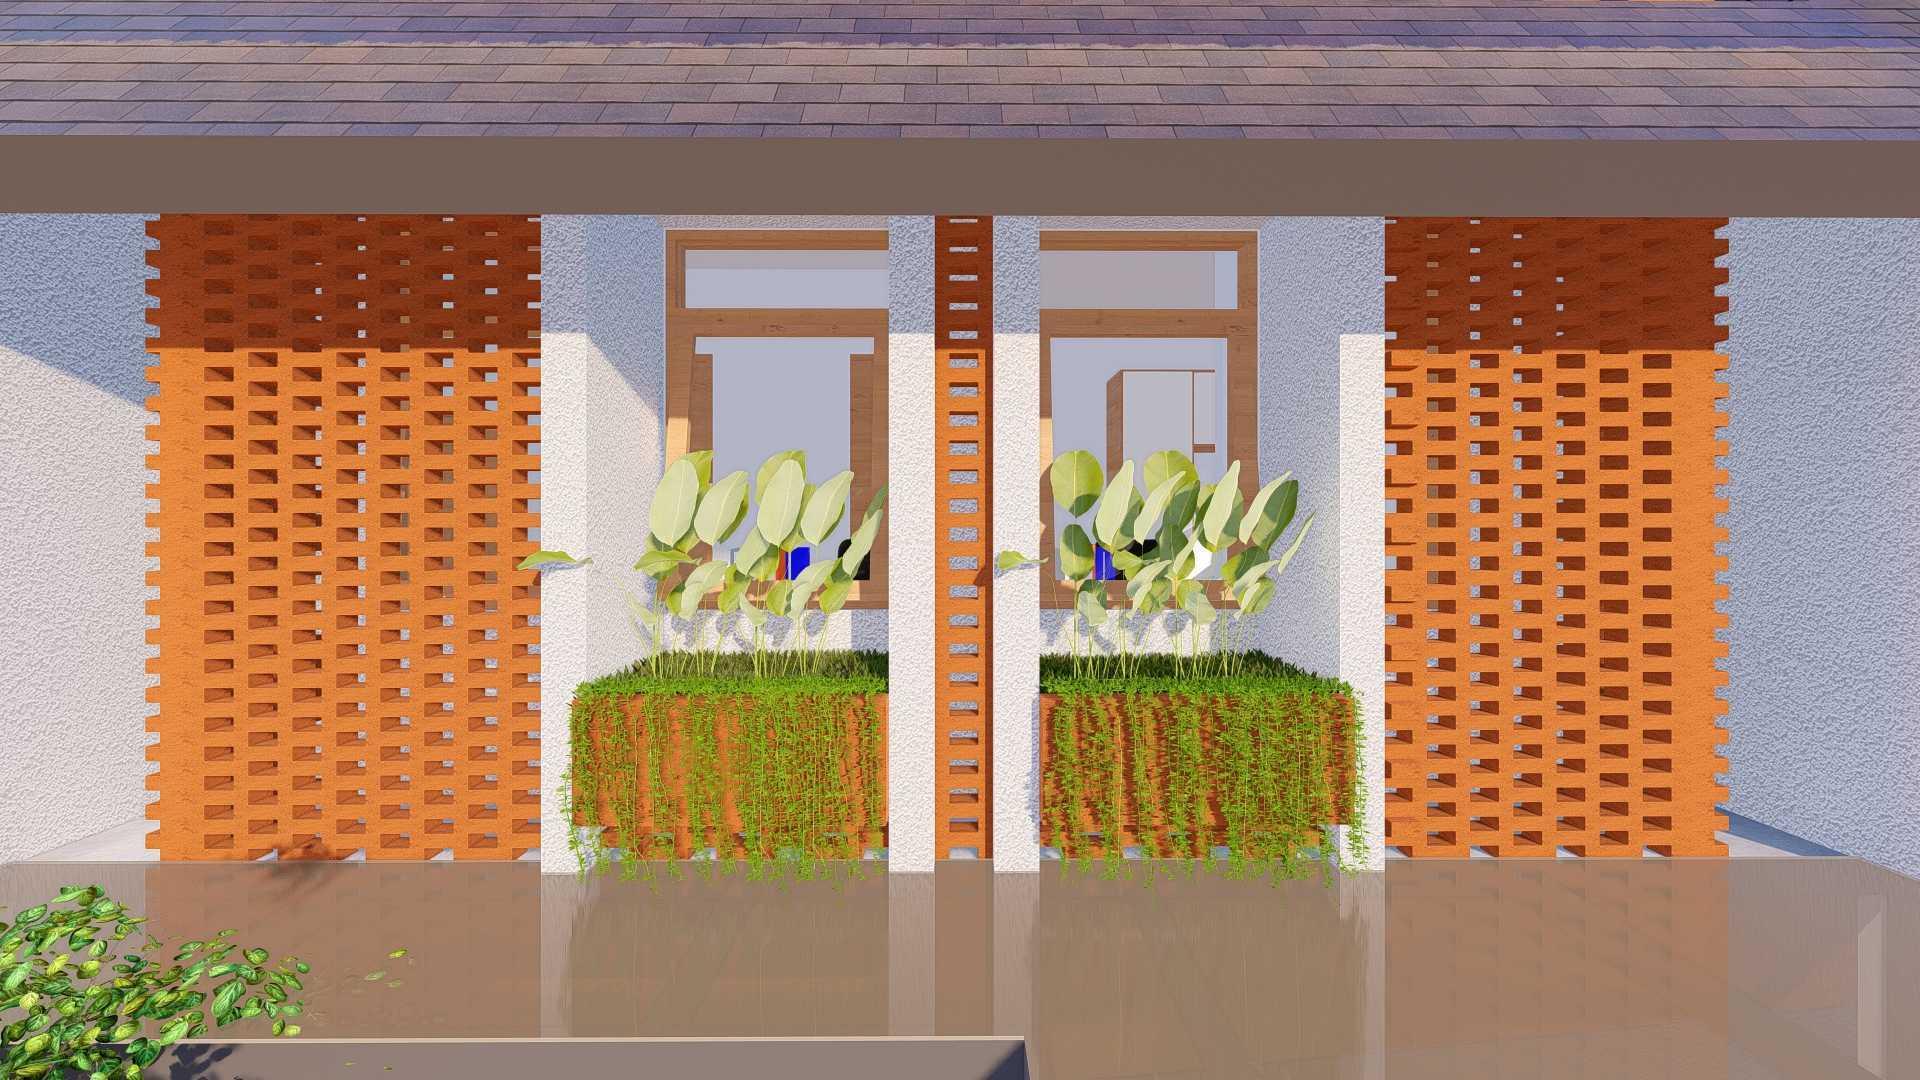 San+ Architect Kost Dh Surakarta, Kota Surakarta, Jawa Tengah, Indonesia Surakarta, Kota Surakarta, Jawa Tengah, Indonesia San-Architect-Kost-Dh   132877